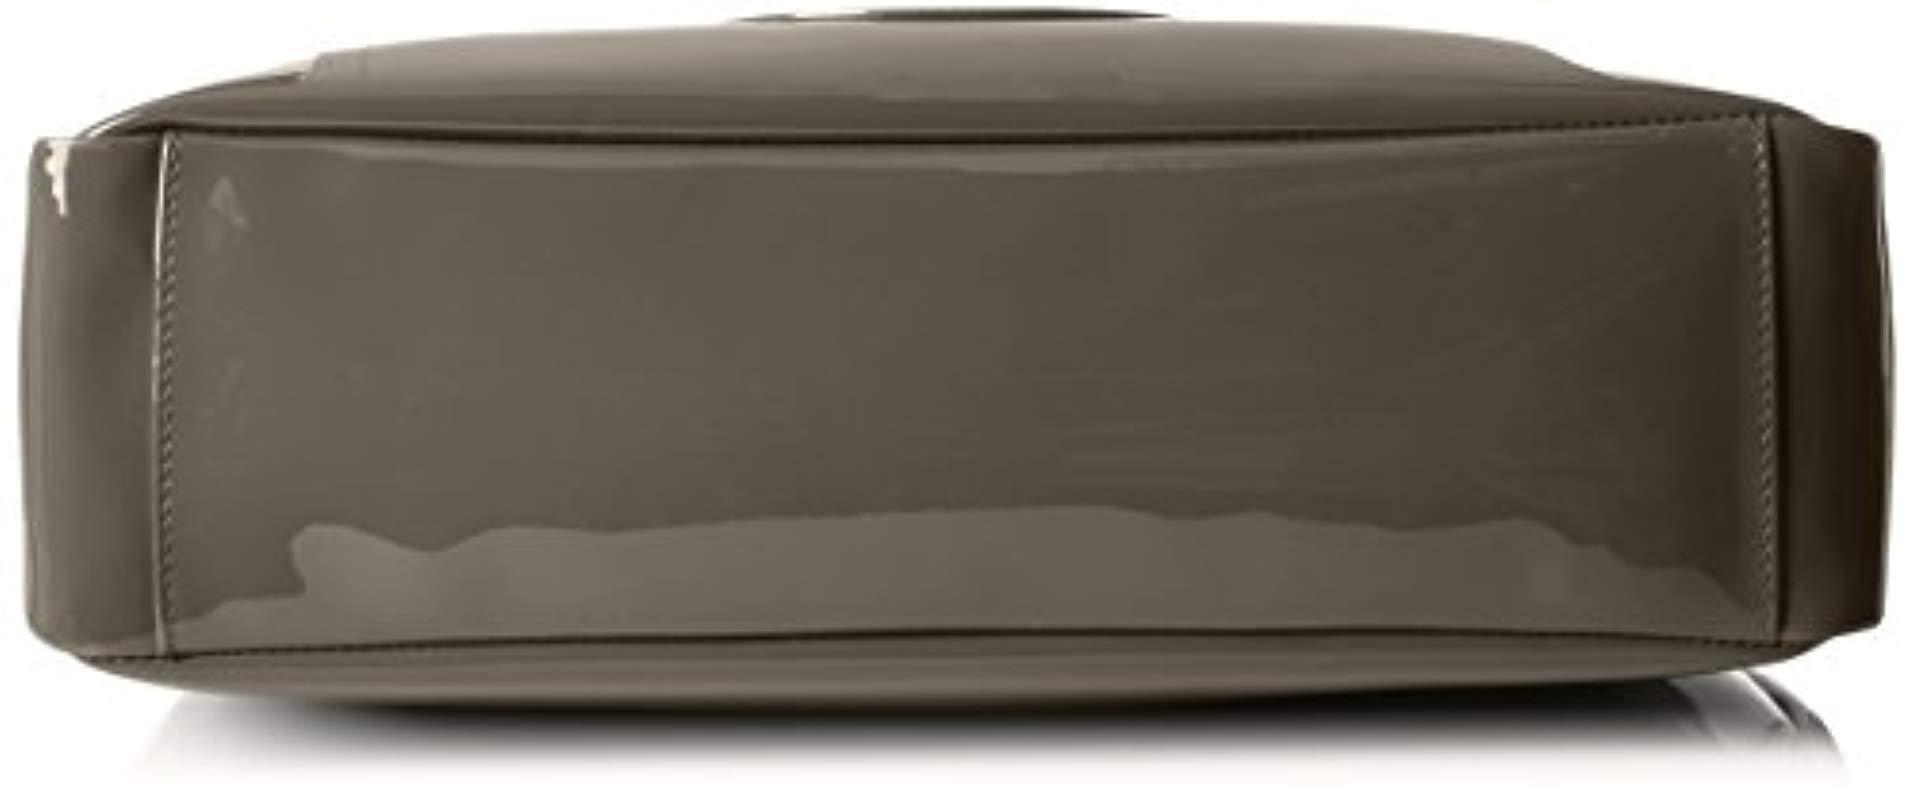 Lyst - Armani Jeans Eco Patent Leather East West Logo Tote for Men 38e83c0e17fcf